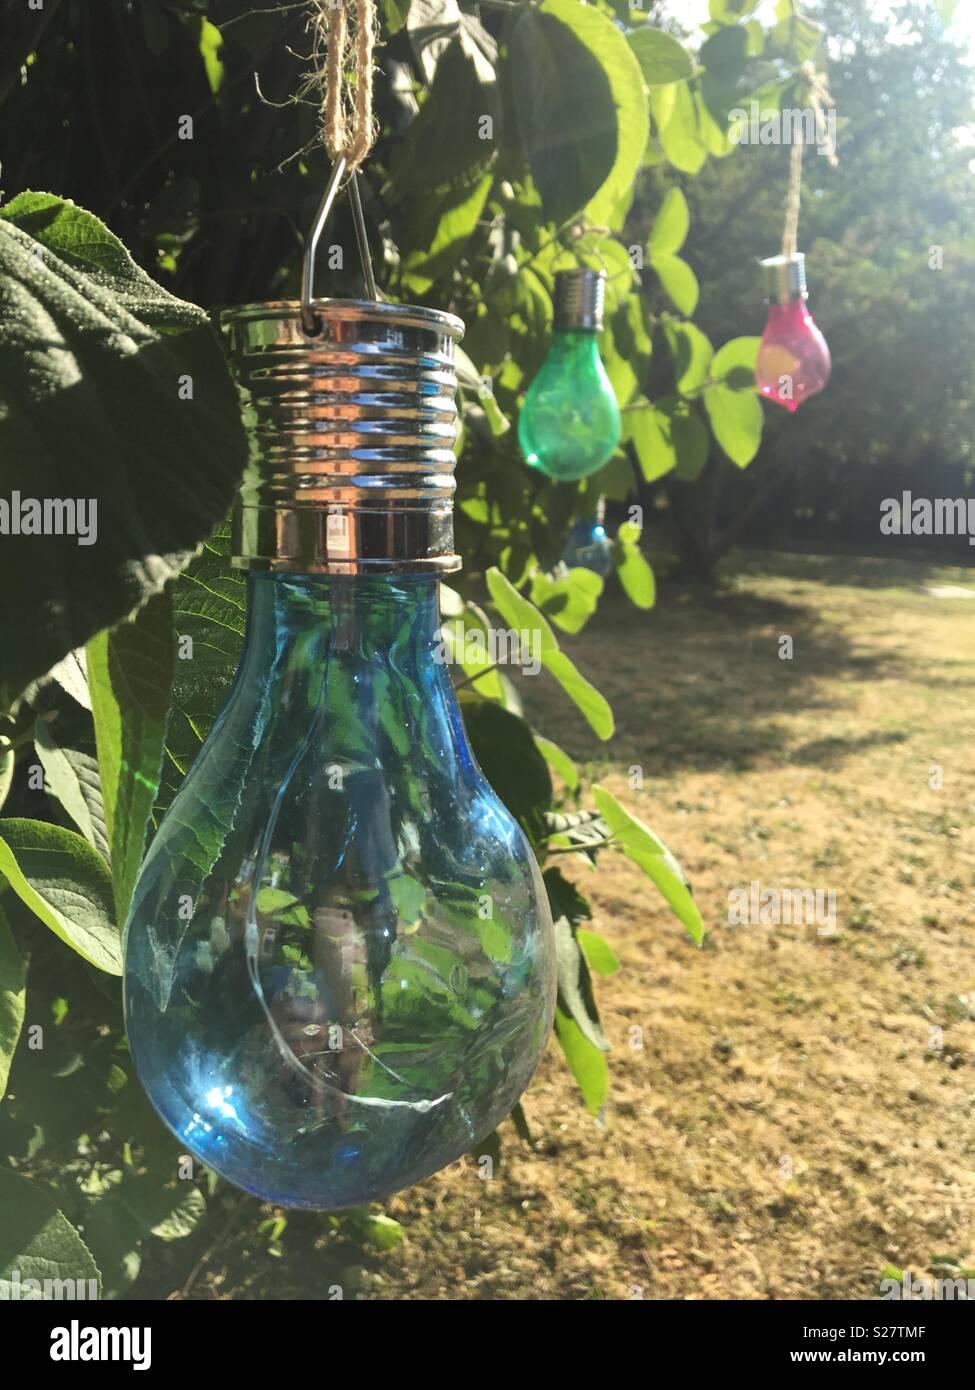 Brightly coloured solar garden lights - Stock Image